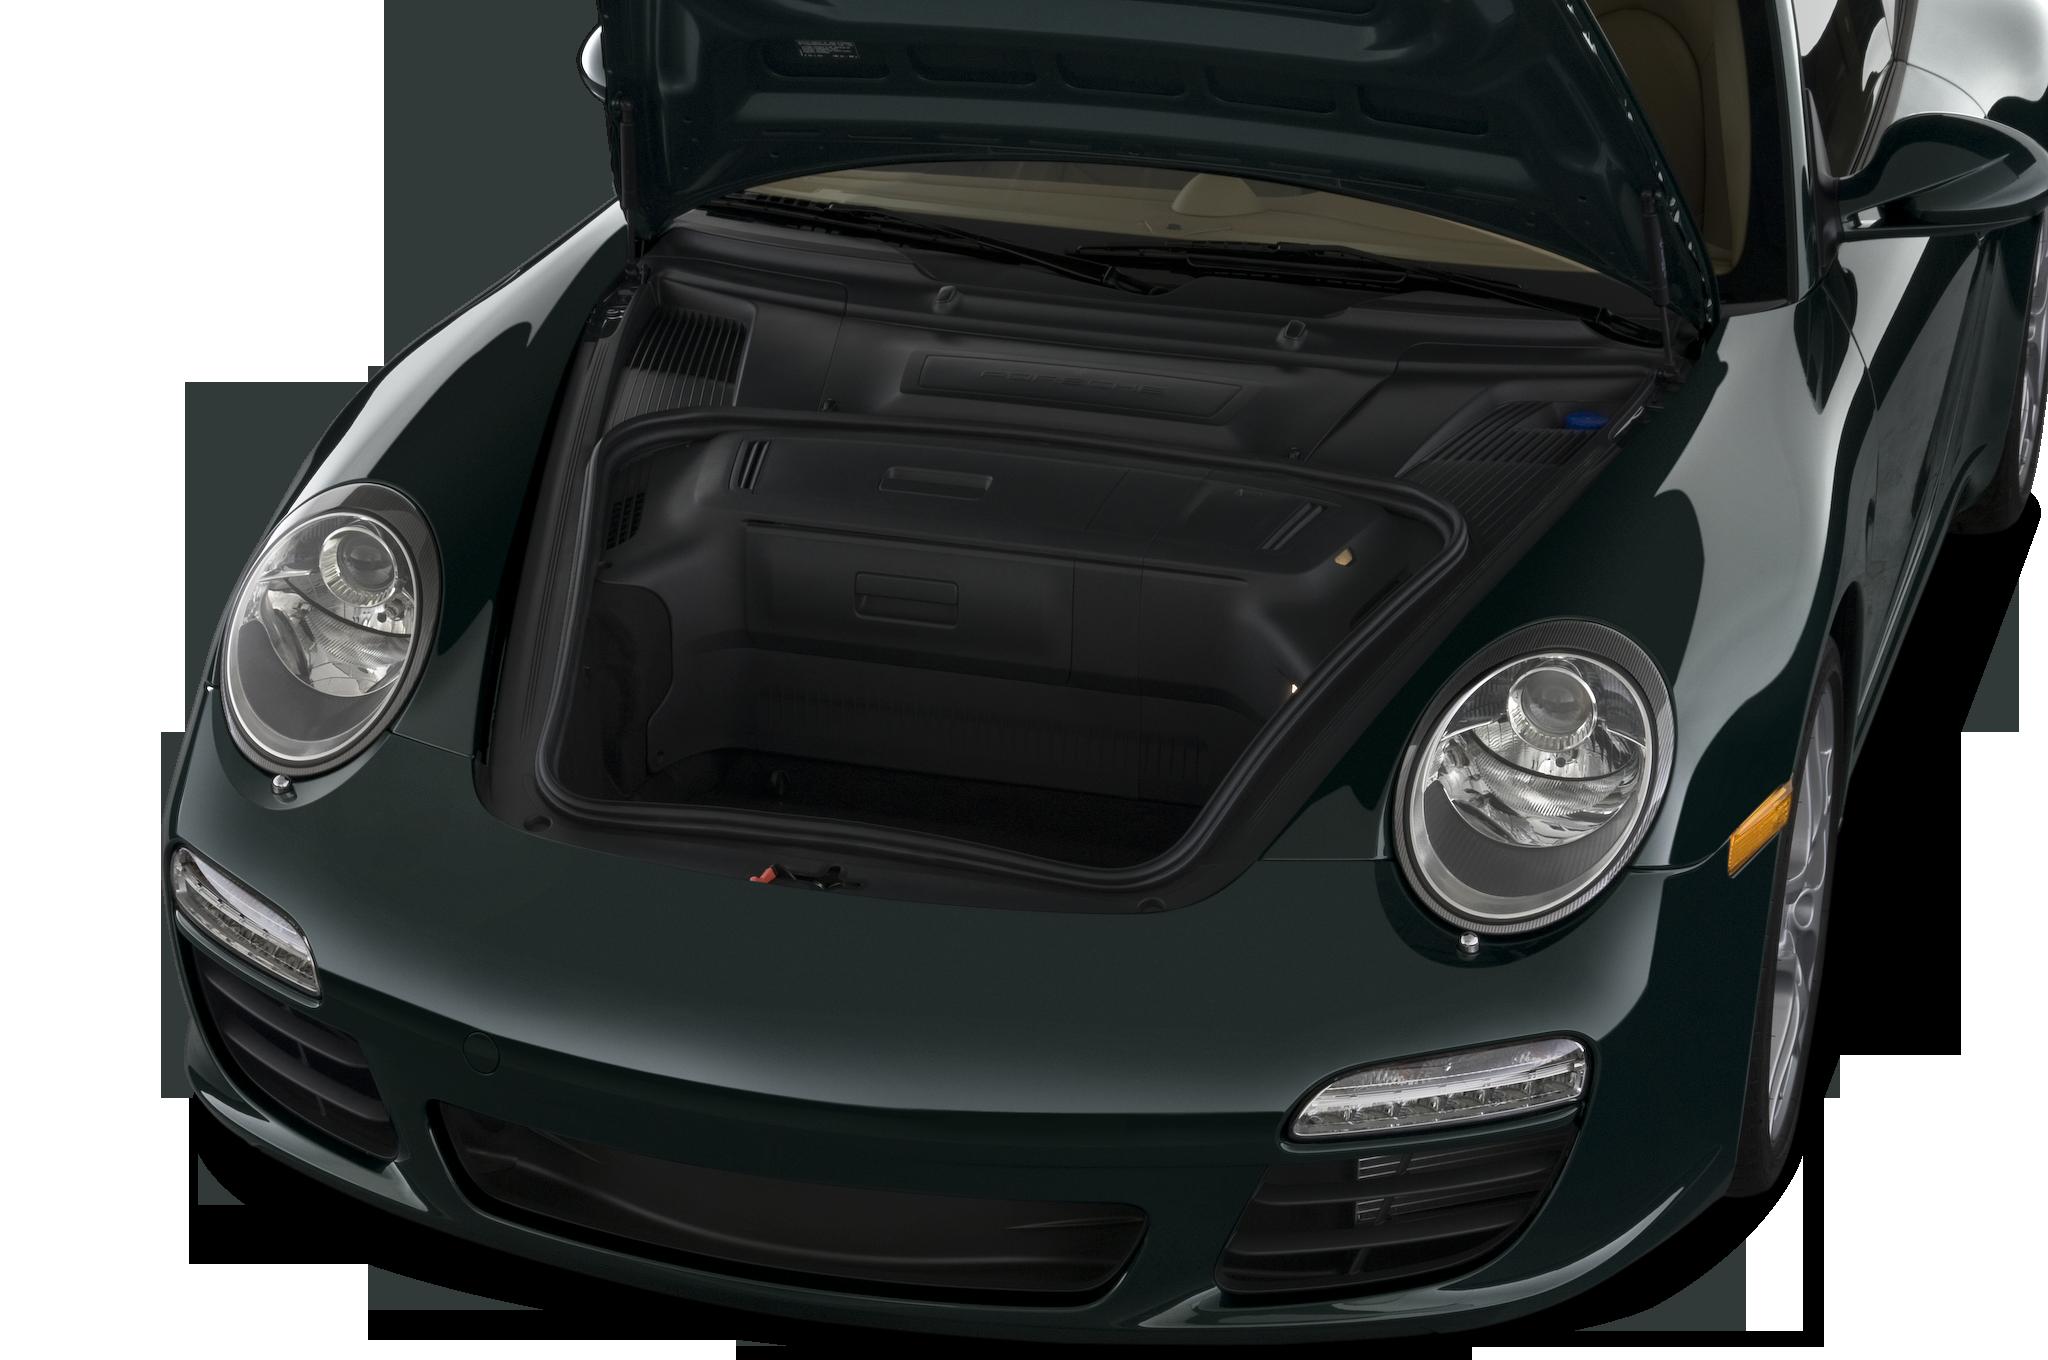 2010-porsche-911-carrera-s-coupe-trunk Exciting Porsche 911 Gt2 La Centrale Cars Trend